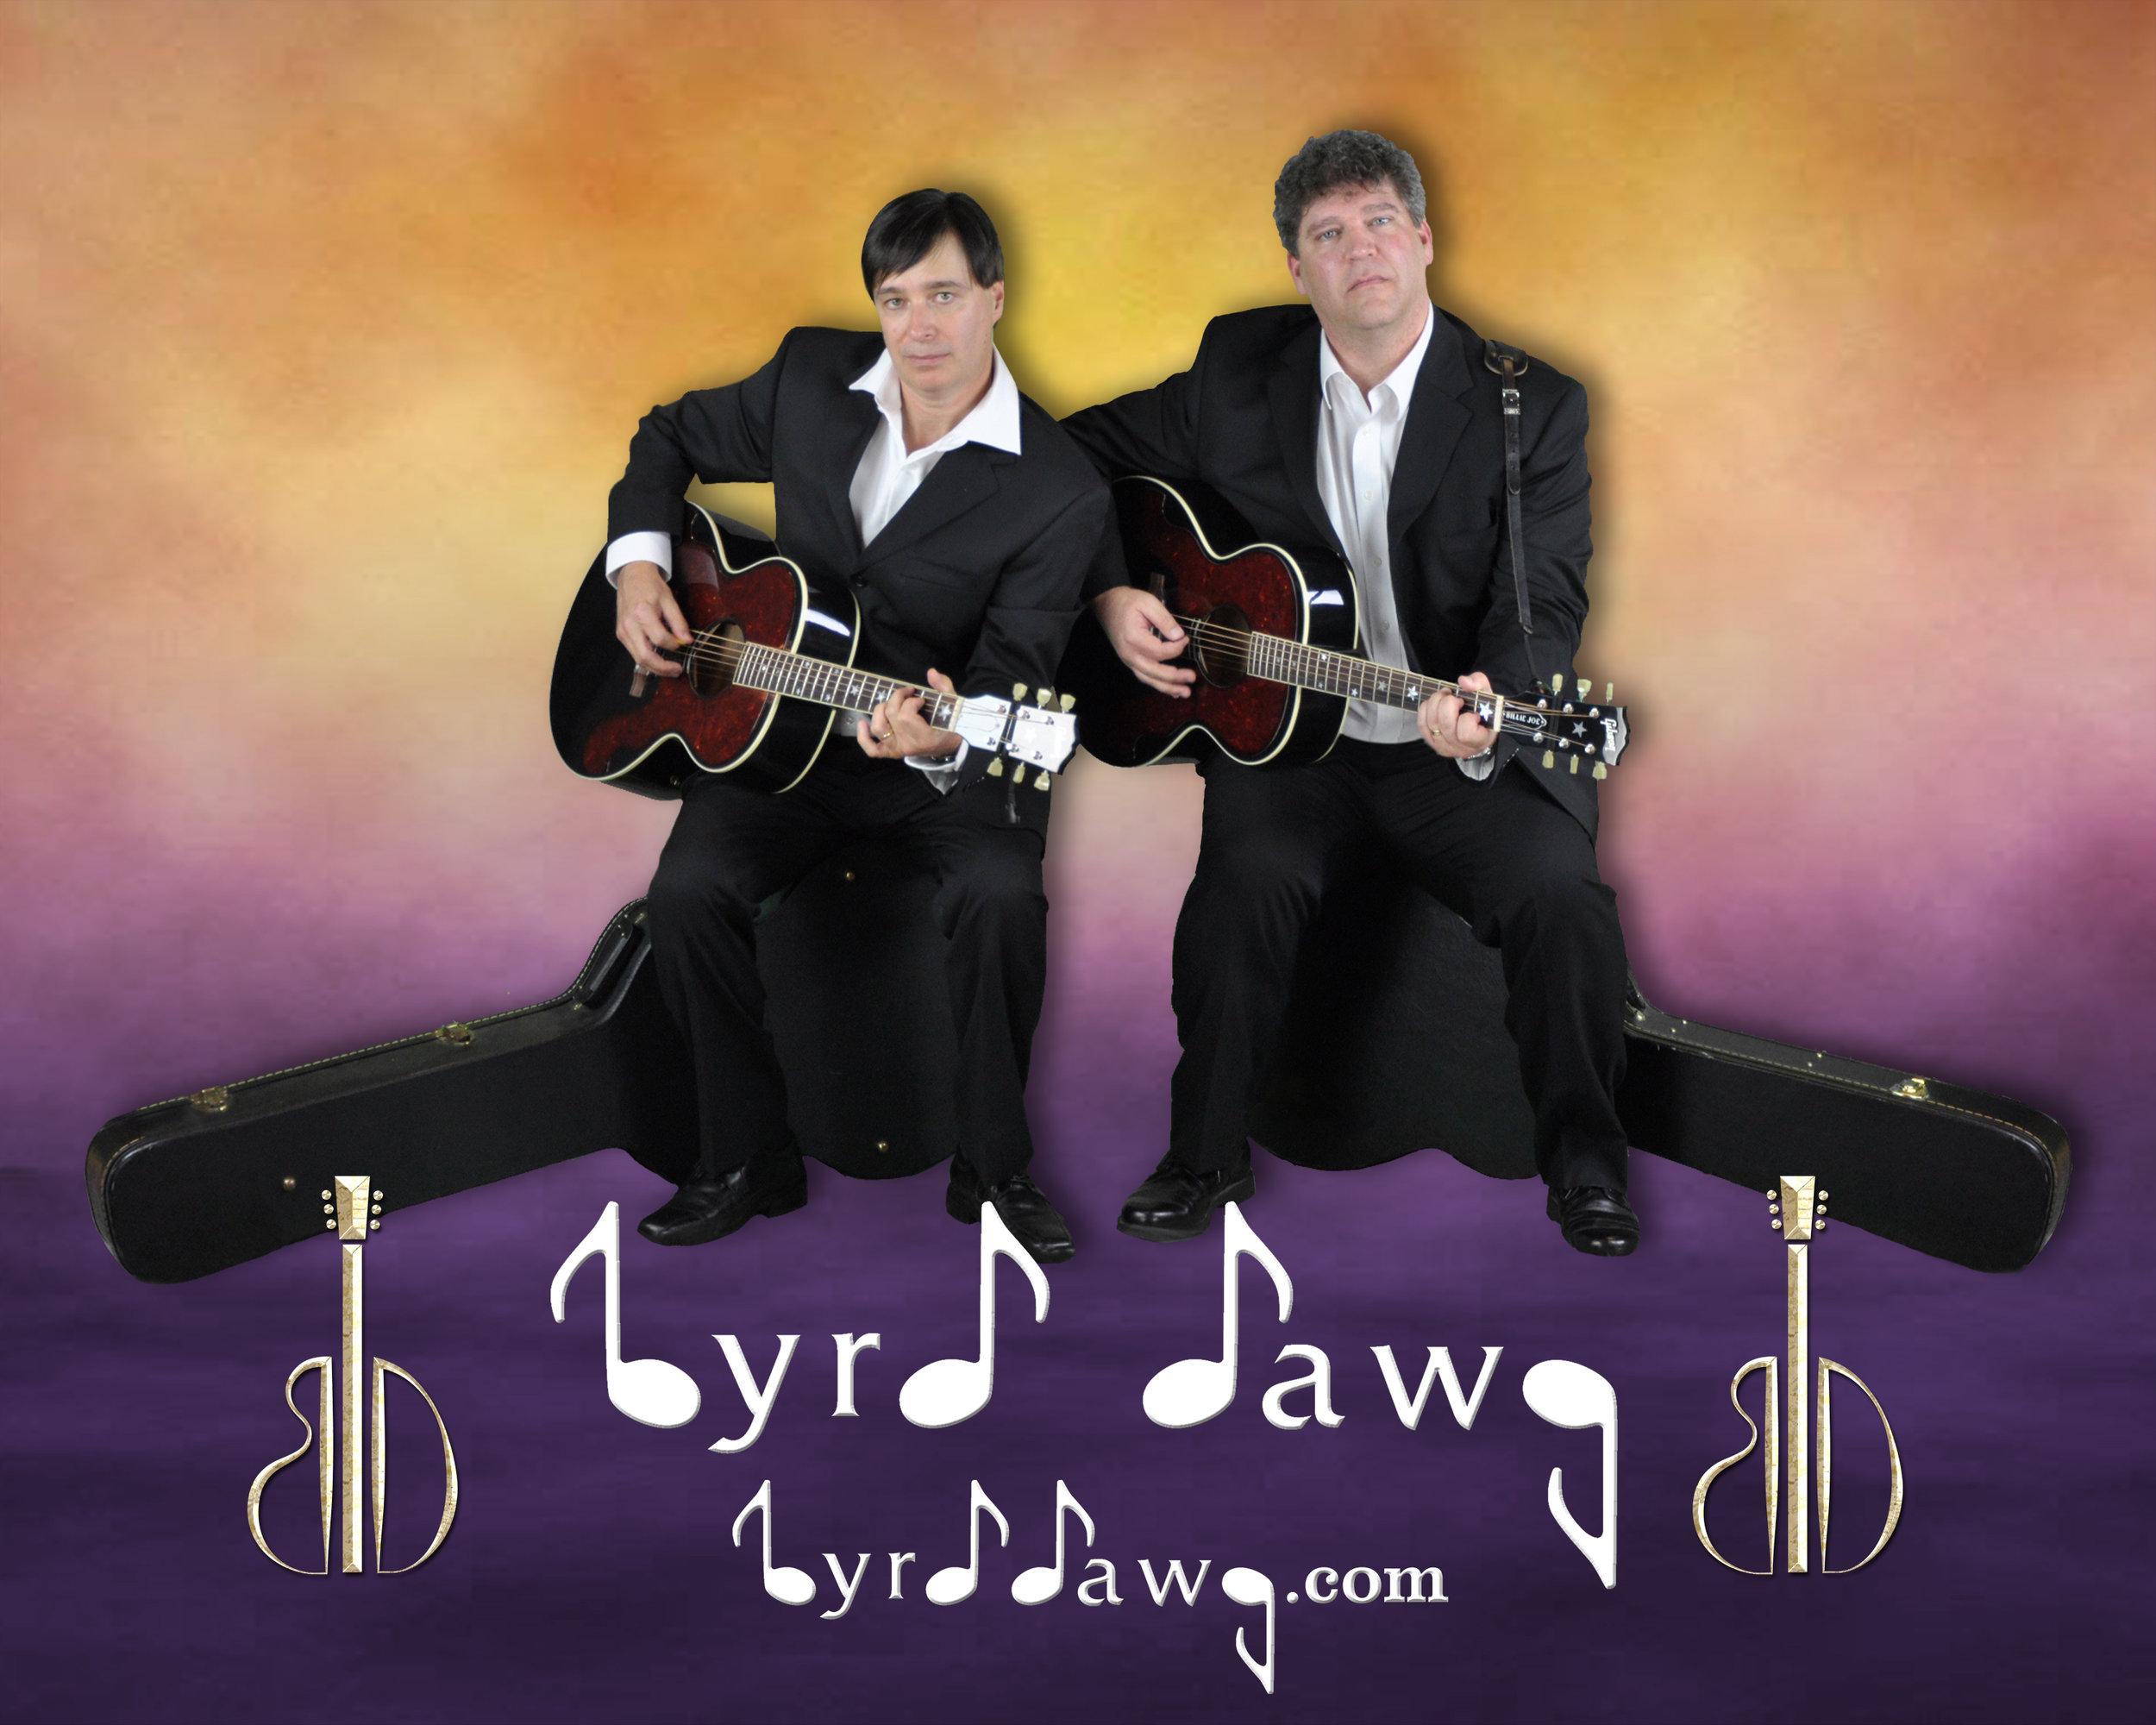 7:00 - 8:00Byrd Dawg - Everly Brothers/ Simon and Garfunkel Tribute -